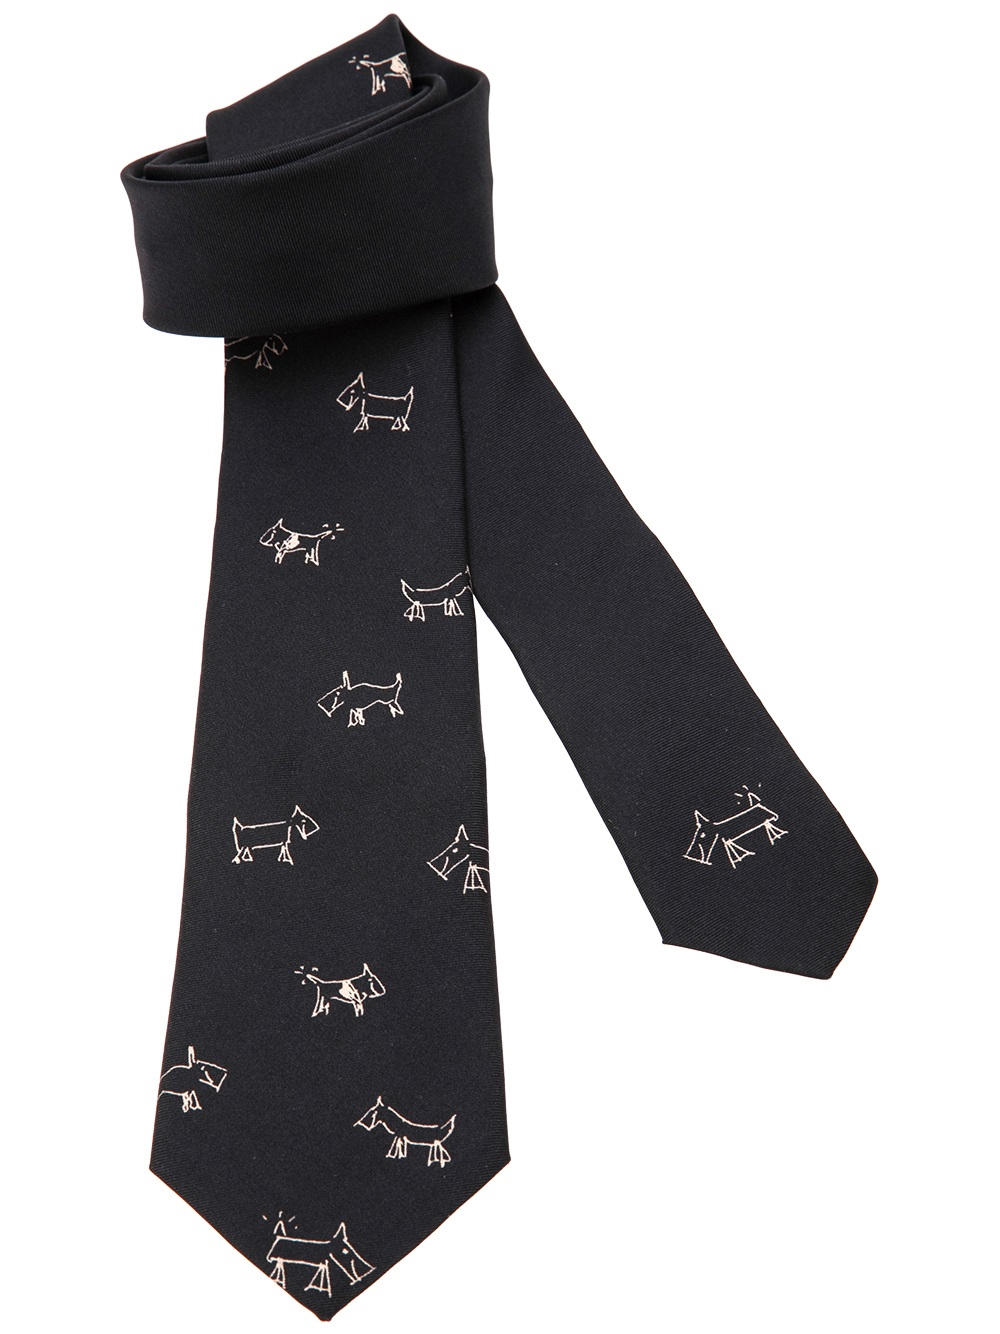 Paul smith Dog Print Tie in Black for Men | Lyst